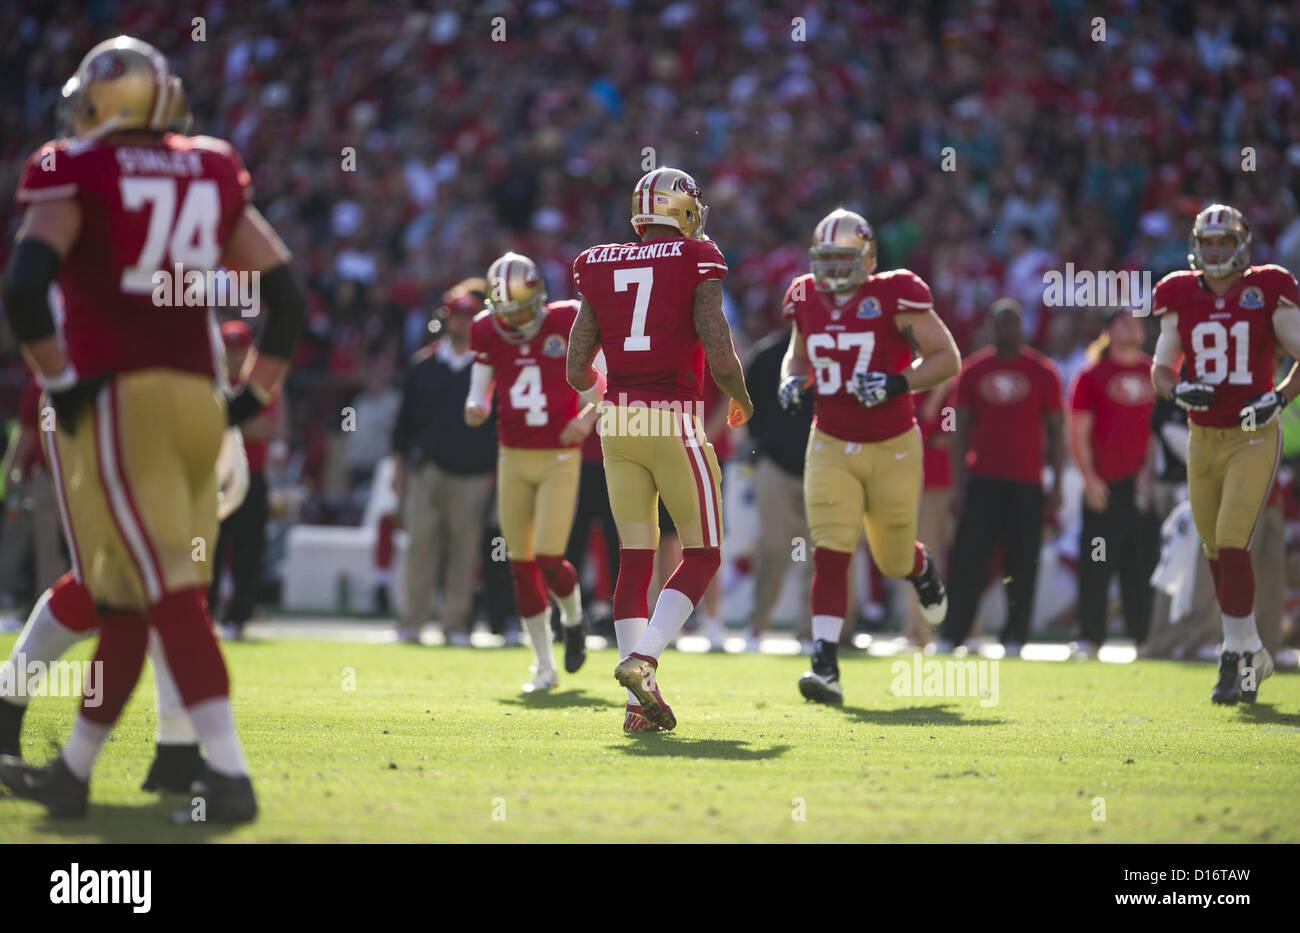 Dec. 9, 2012 - San Francisco, CA, USA - San Francisco 49ers quarterback Colin Kaepernick (7) walks off the field - Stock Image